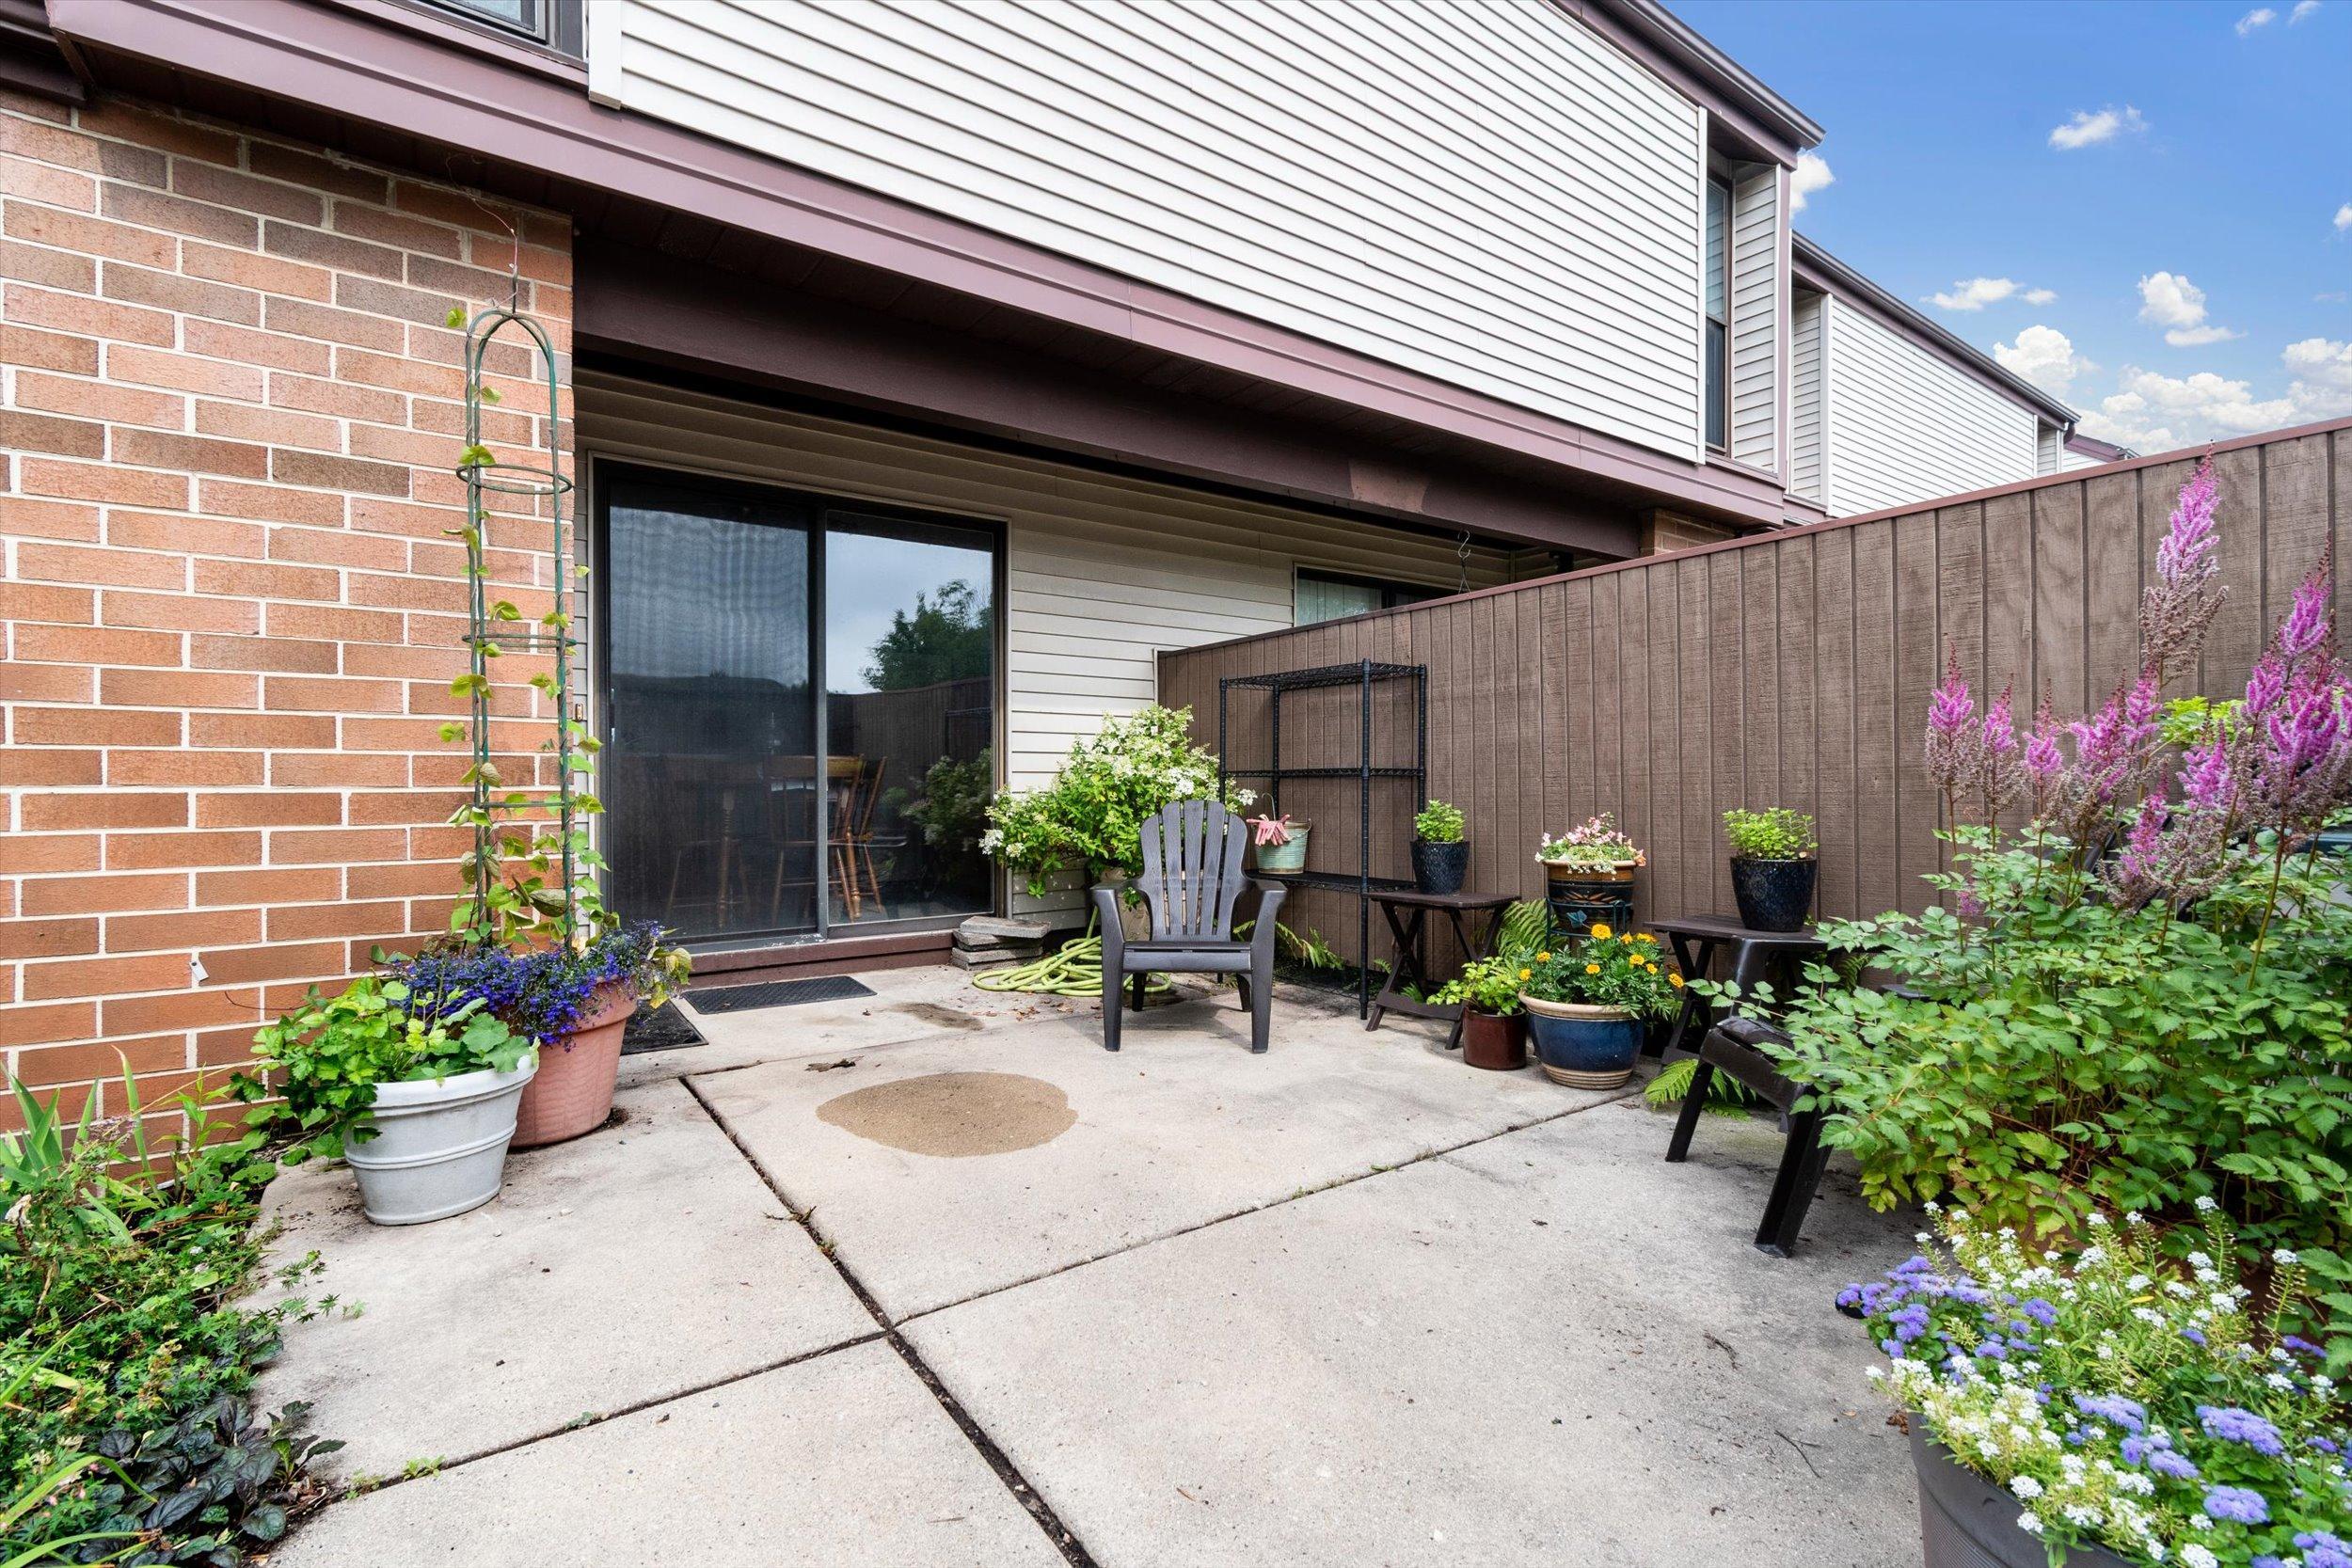 1531 Edgerton Ave, Milwaukee, Wisconsin 53221, 3 Bedrooms Bedrooms, 5 Rooms Rooms,1 BathroomBathrooms,Condominiums,For Sale,Edgerton Ave,1,1754538